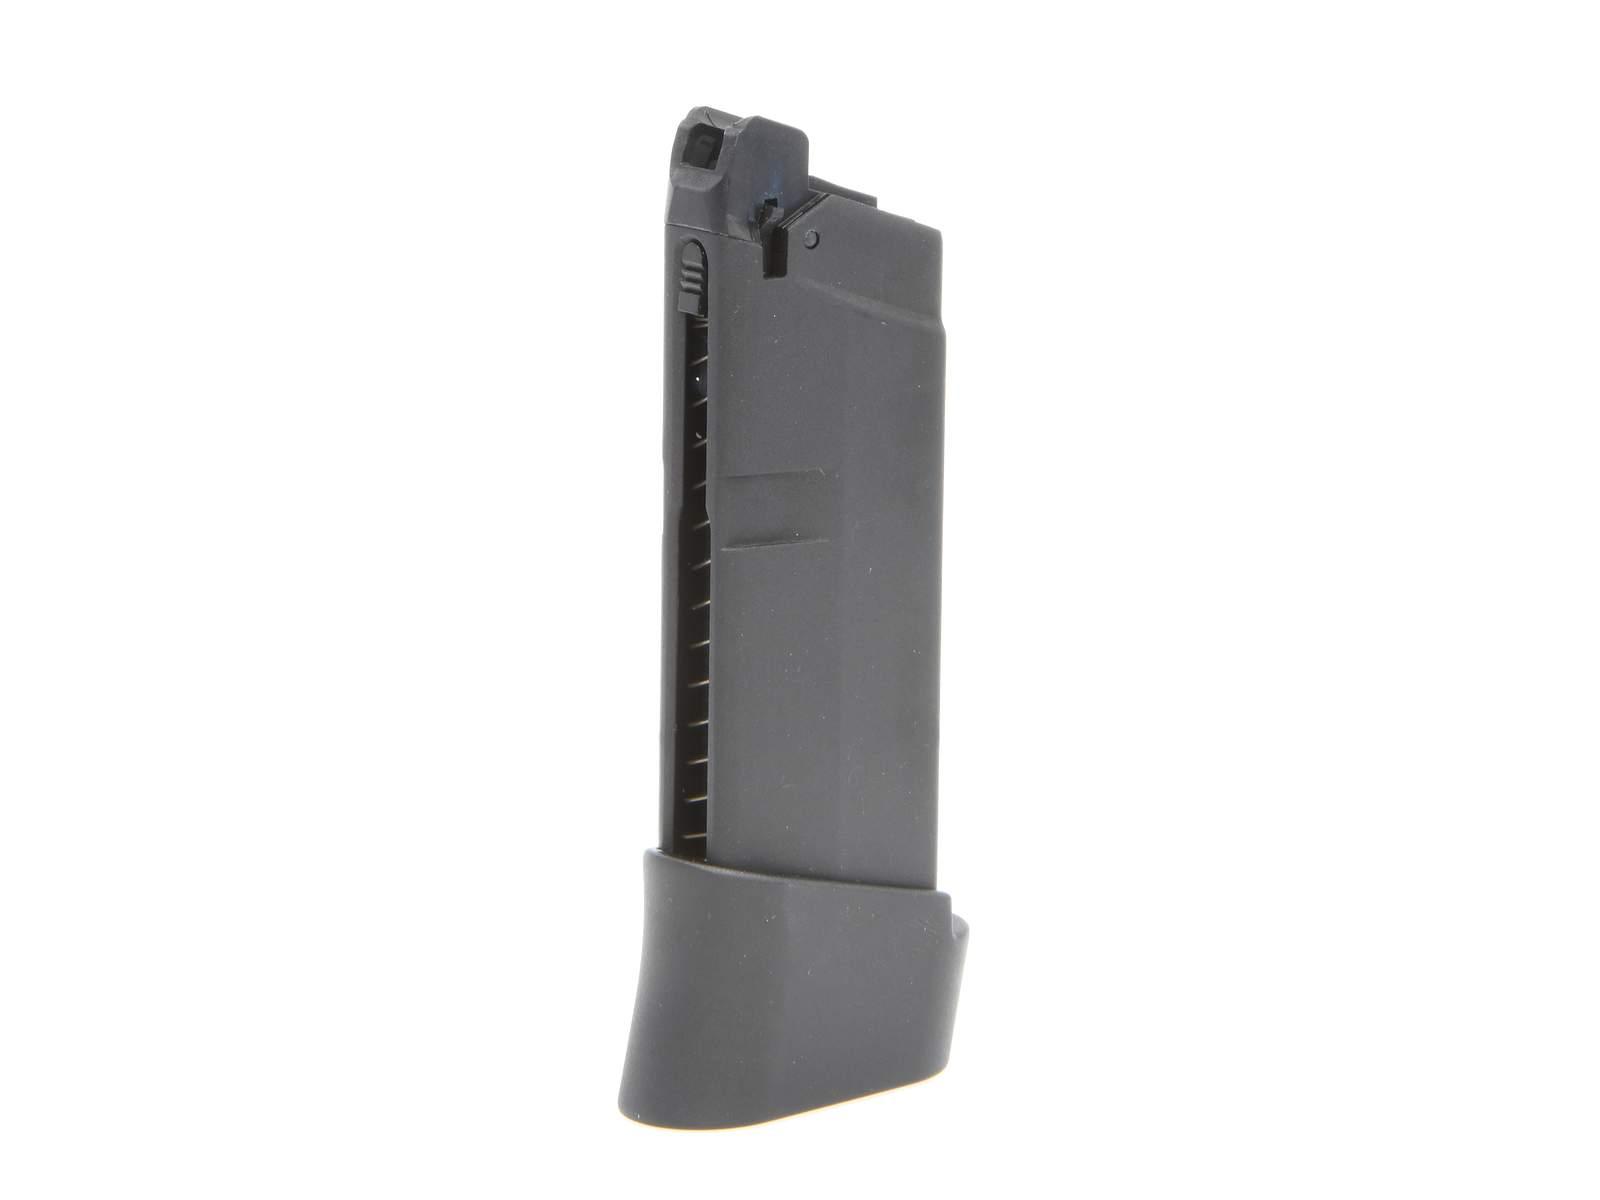 Umarex GlockAirsoft G42 Gen.4 スペアマガジン (Extend Long)